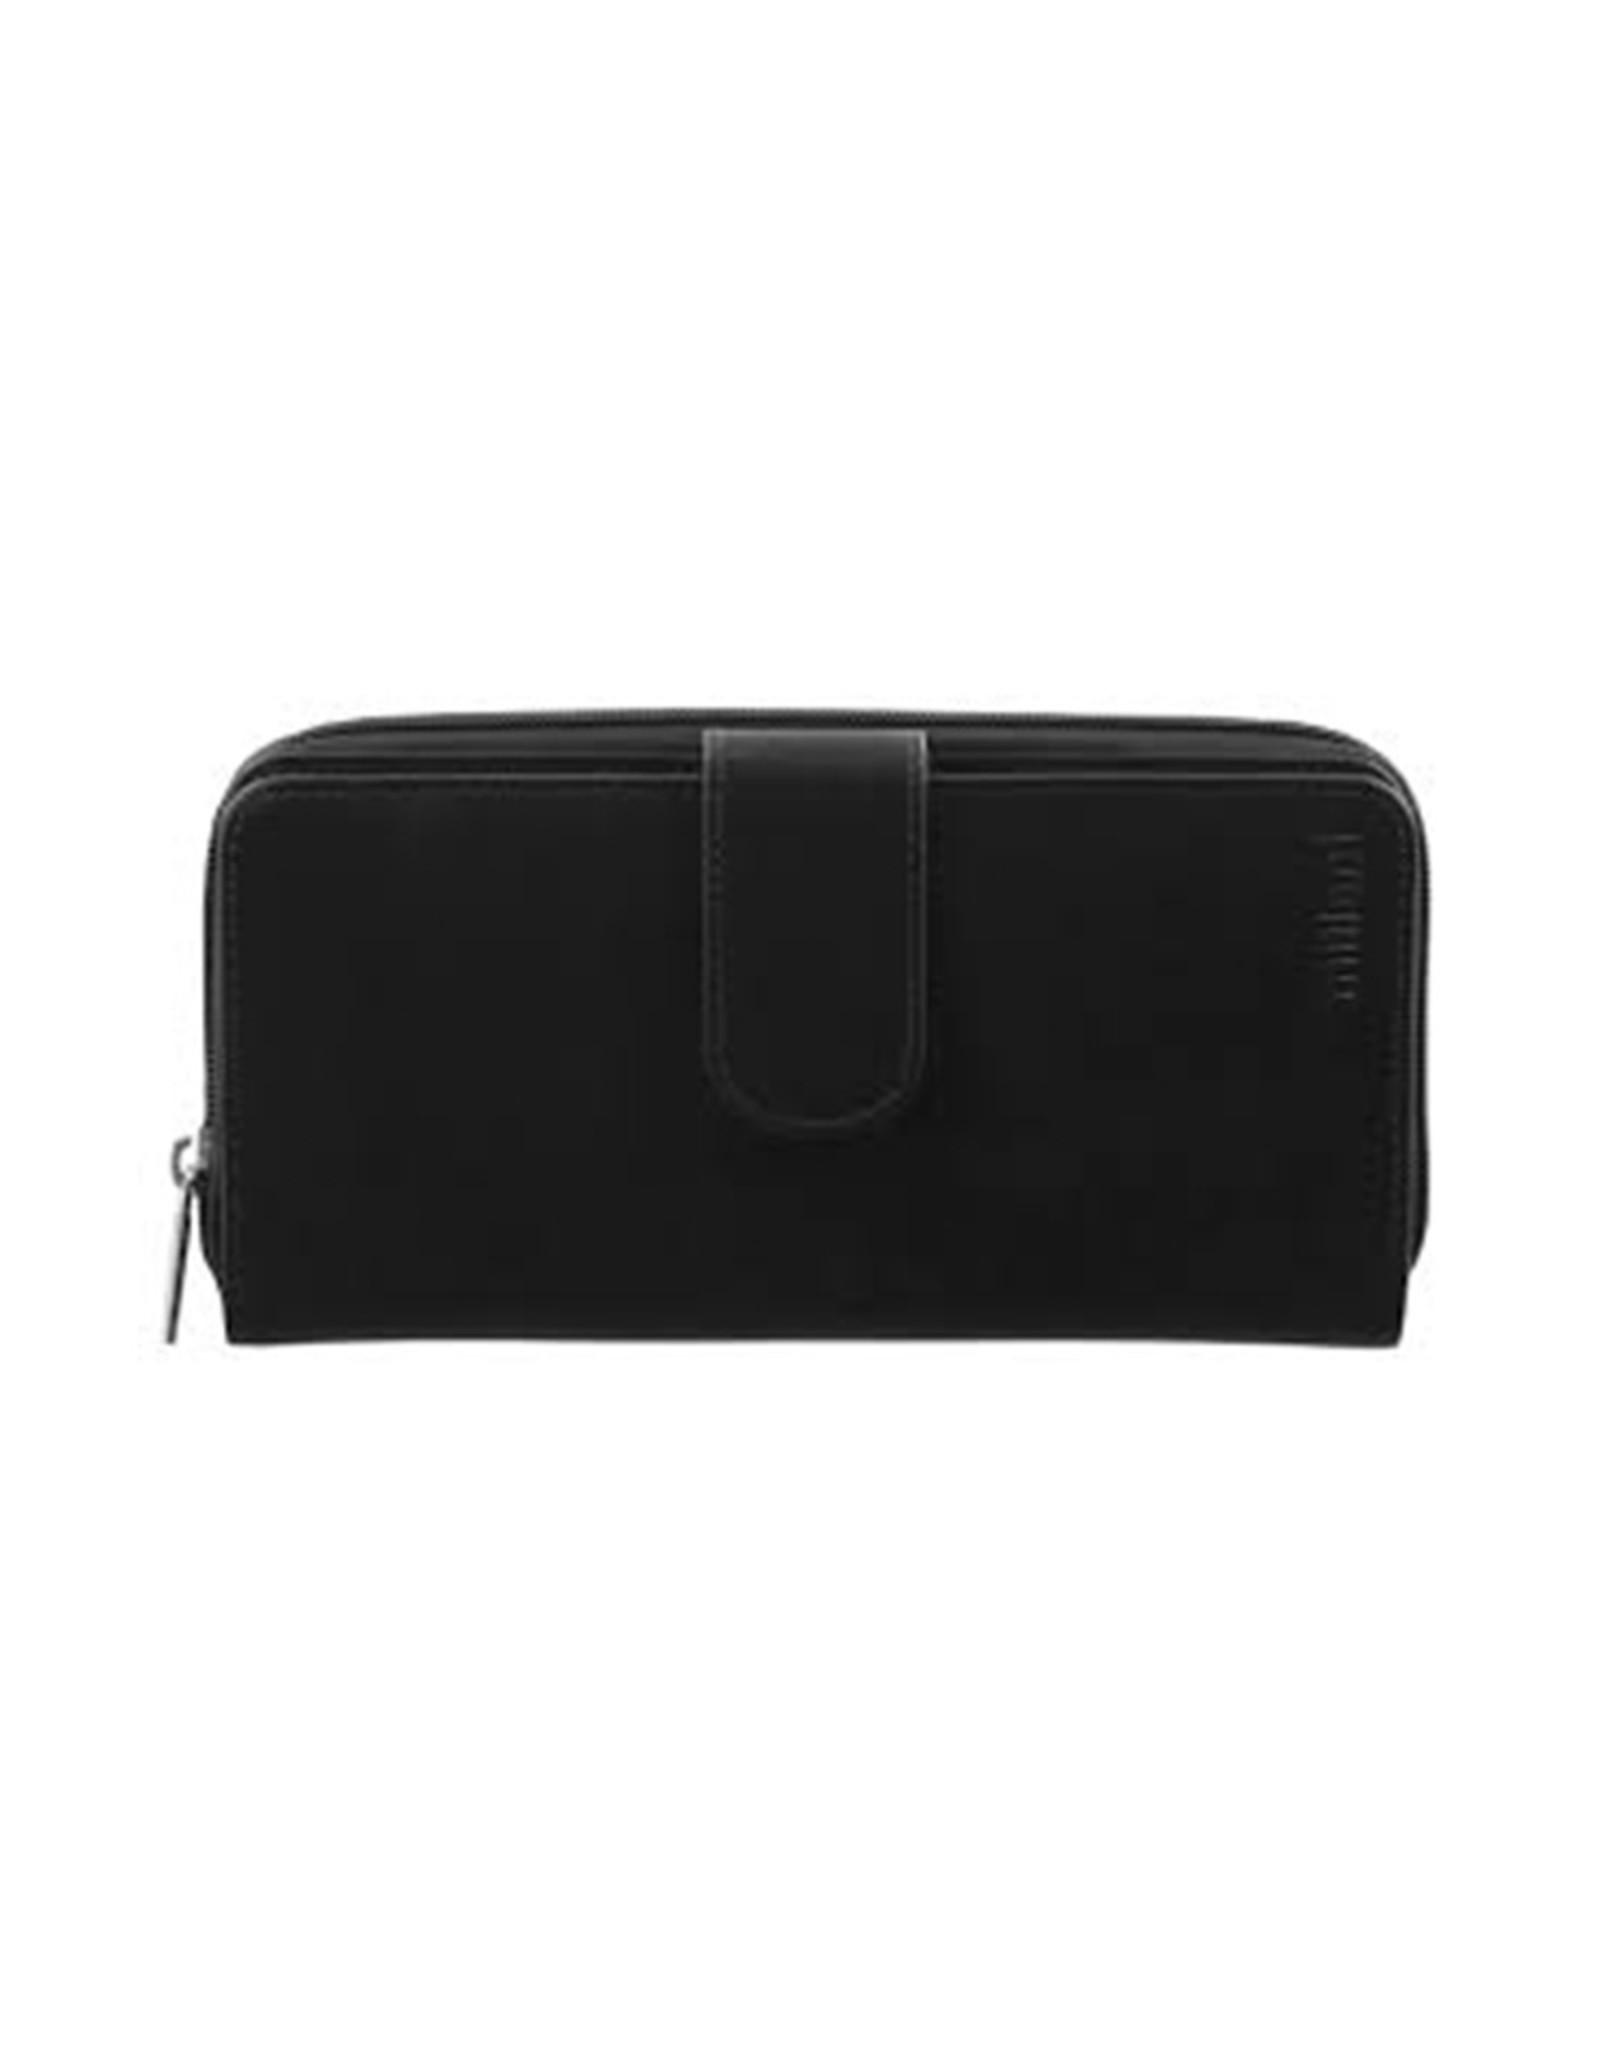 Milleni Leather Ladies Wallet - Black (C2885)